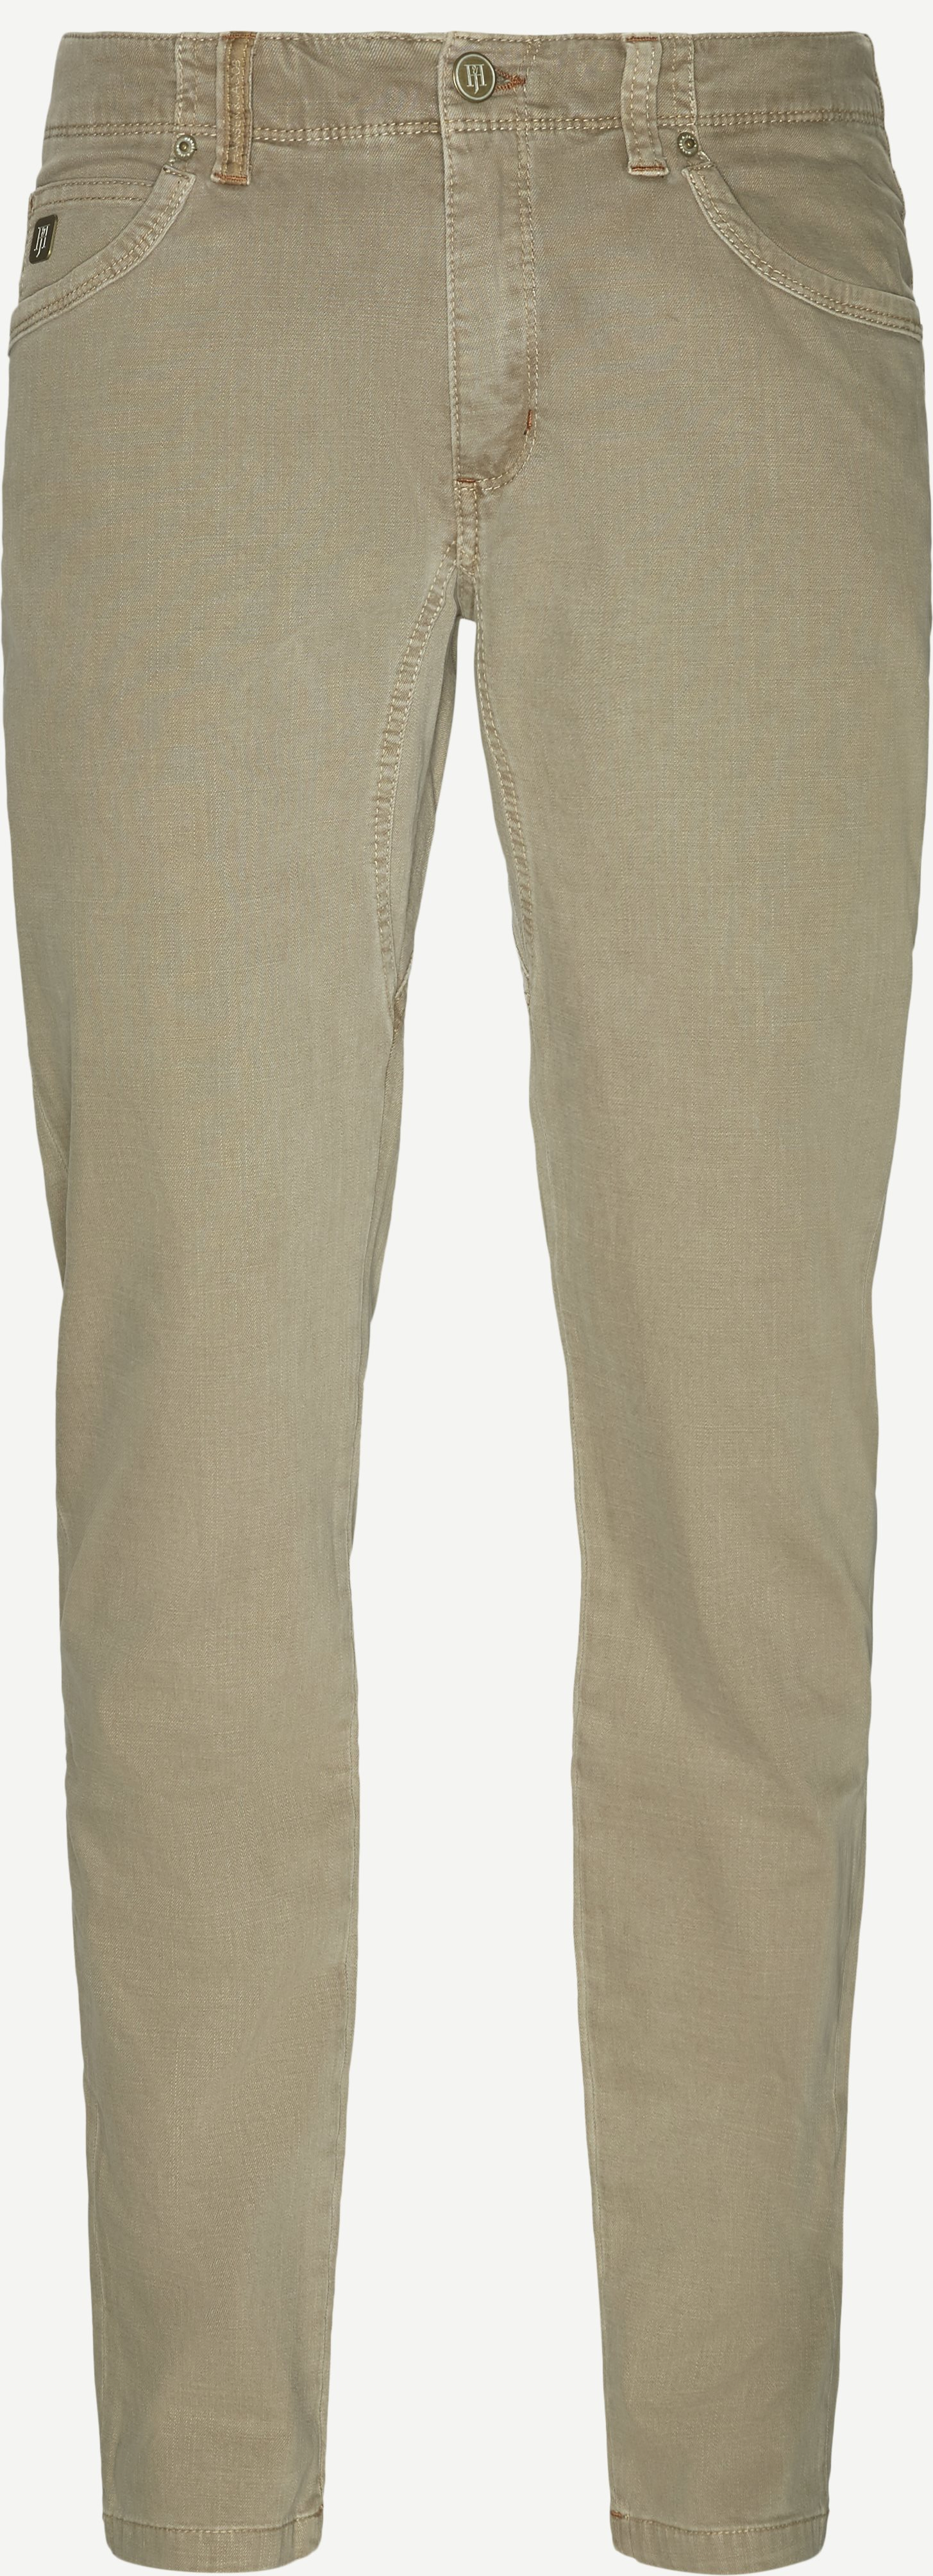 Cut 'N Sew Jeans - Jeans - Regular - Sand